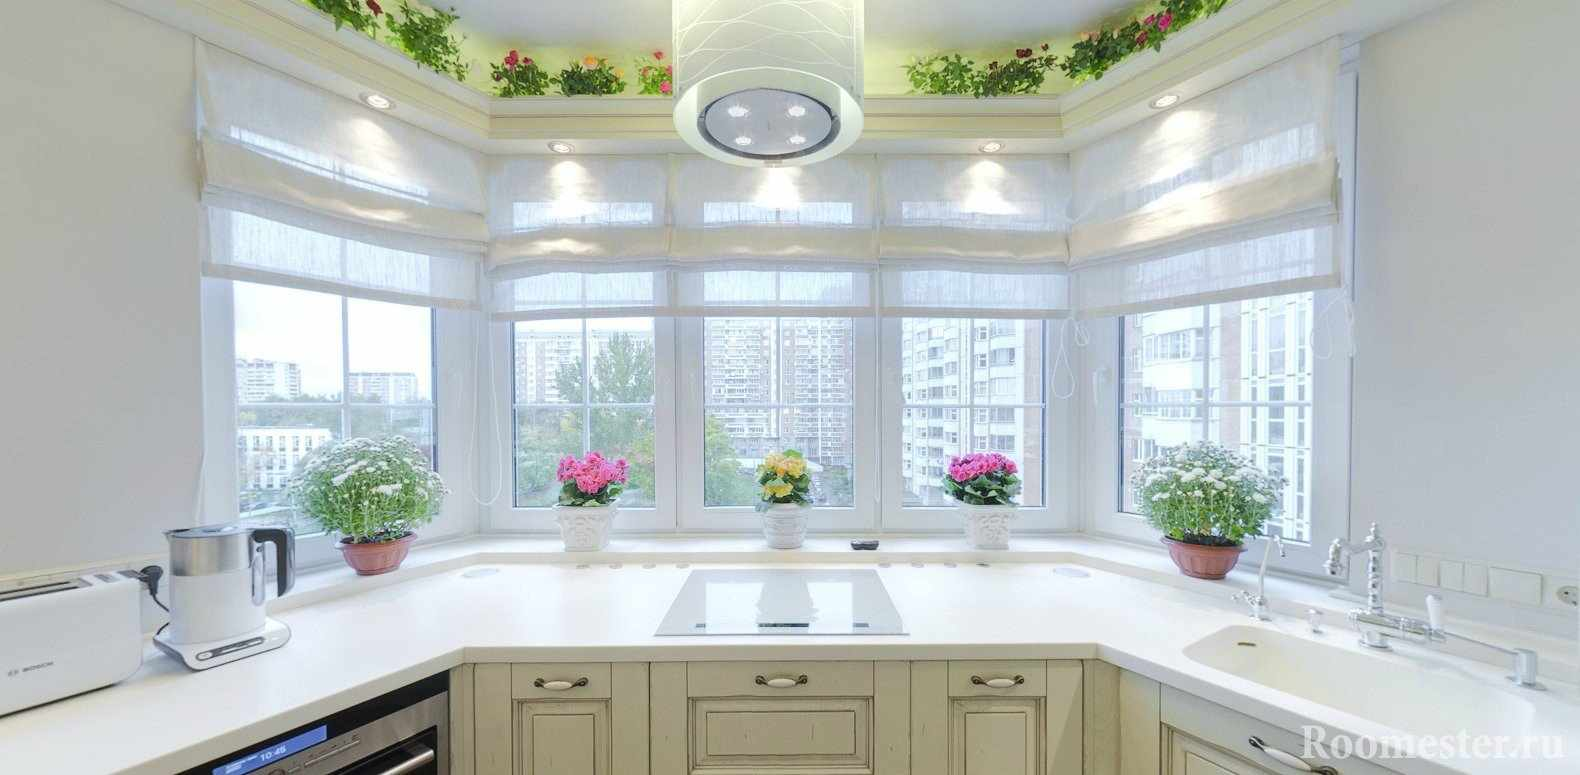 Кухня светло бежевого цвета